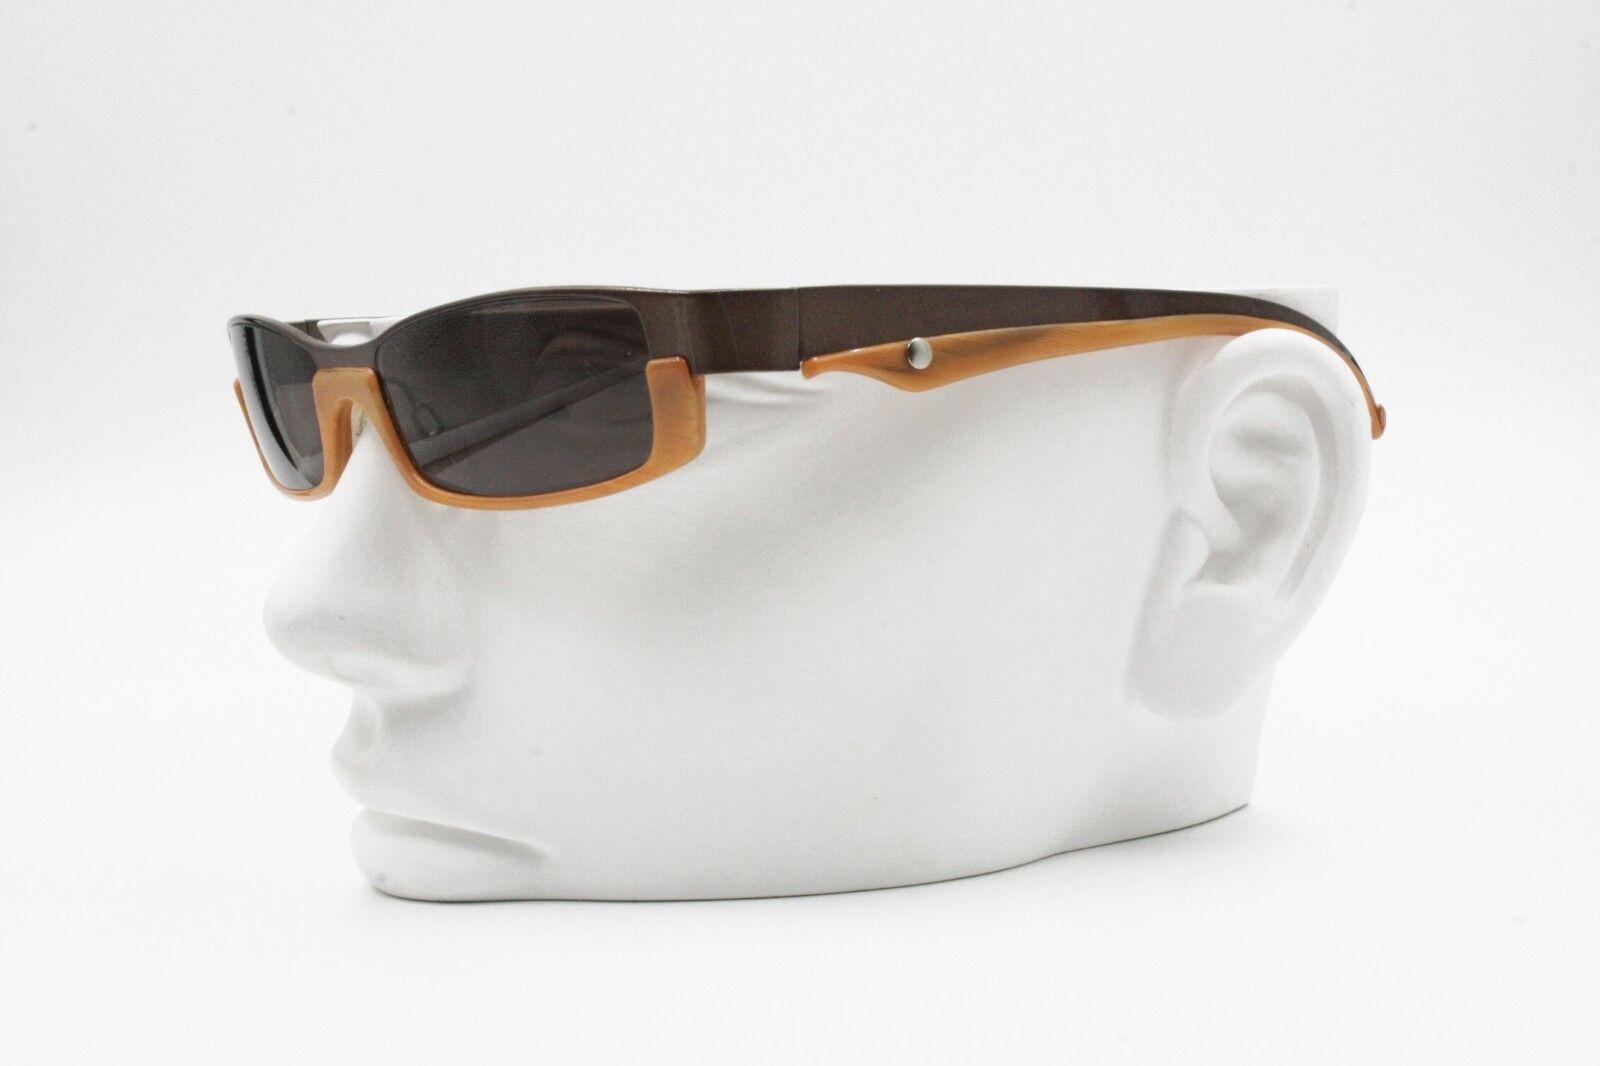 0b26cee262 ... Augusto Valentini mod. 8070 rectangular elegant sunglasses, bronze &  caramel caramel caramel   Big ...